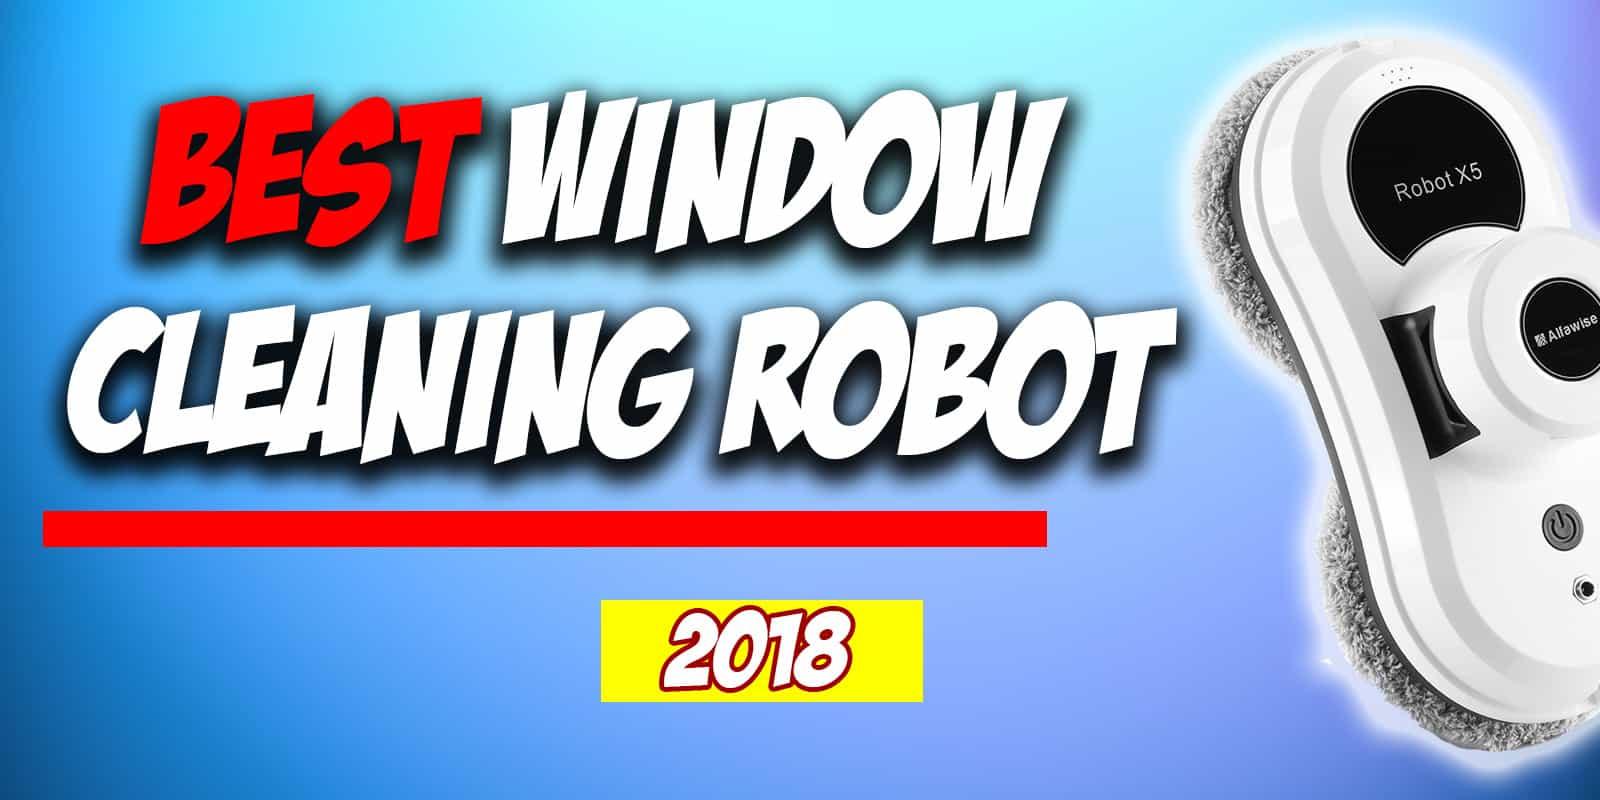 Best Window Cleaning Robot 2018